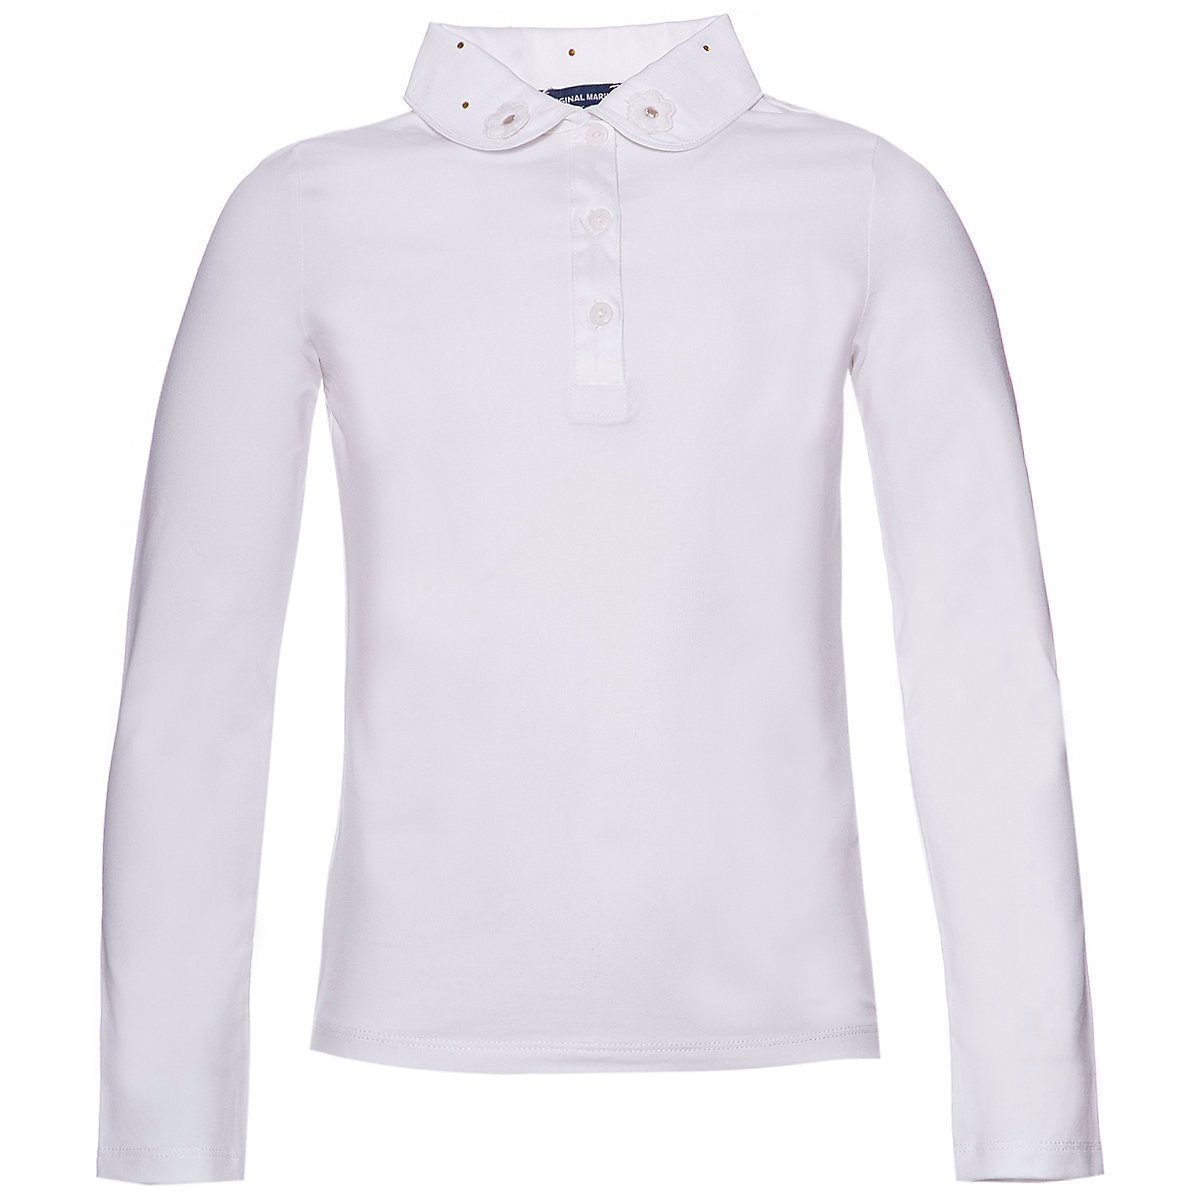 Original Marines Hoodies & Sweatshirts 9500849 Cotton Girls Casual children clothing girl original marines hoodies